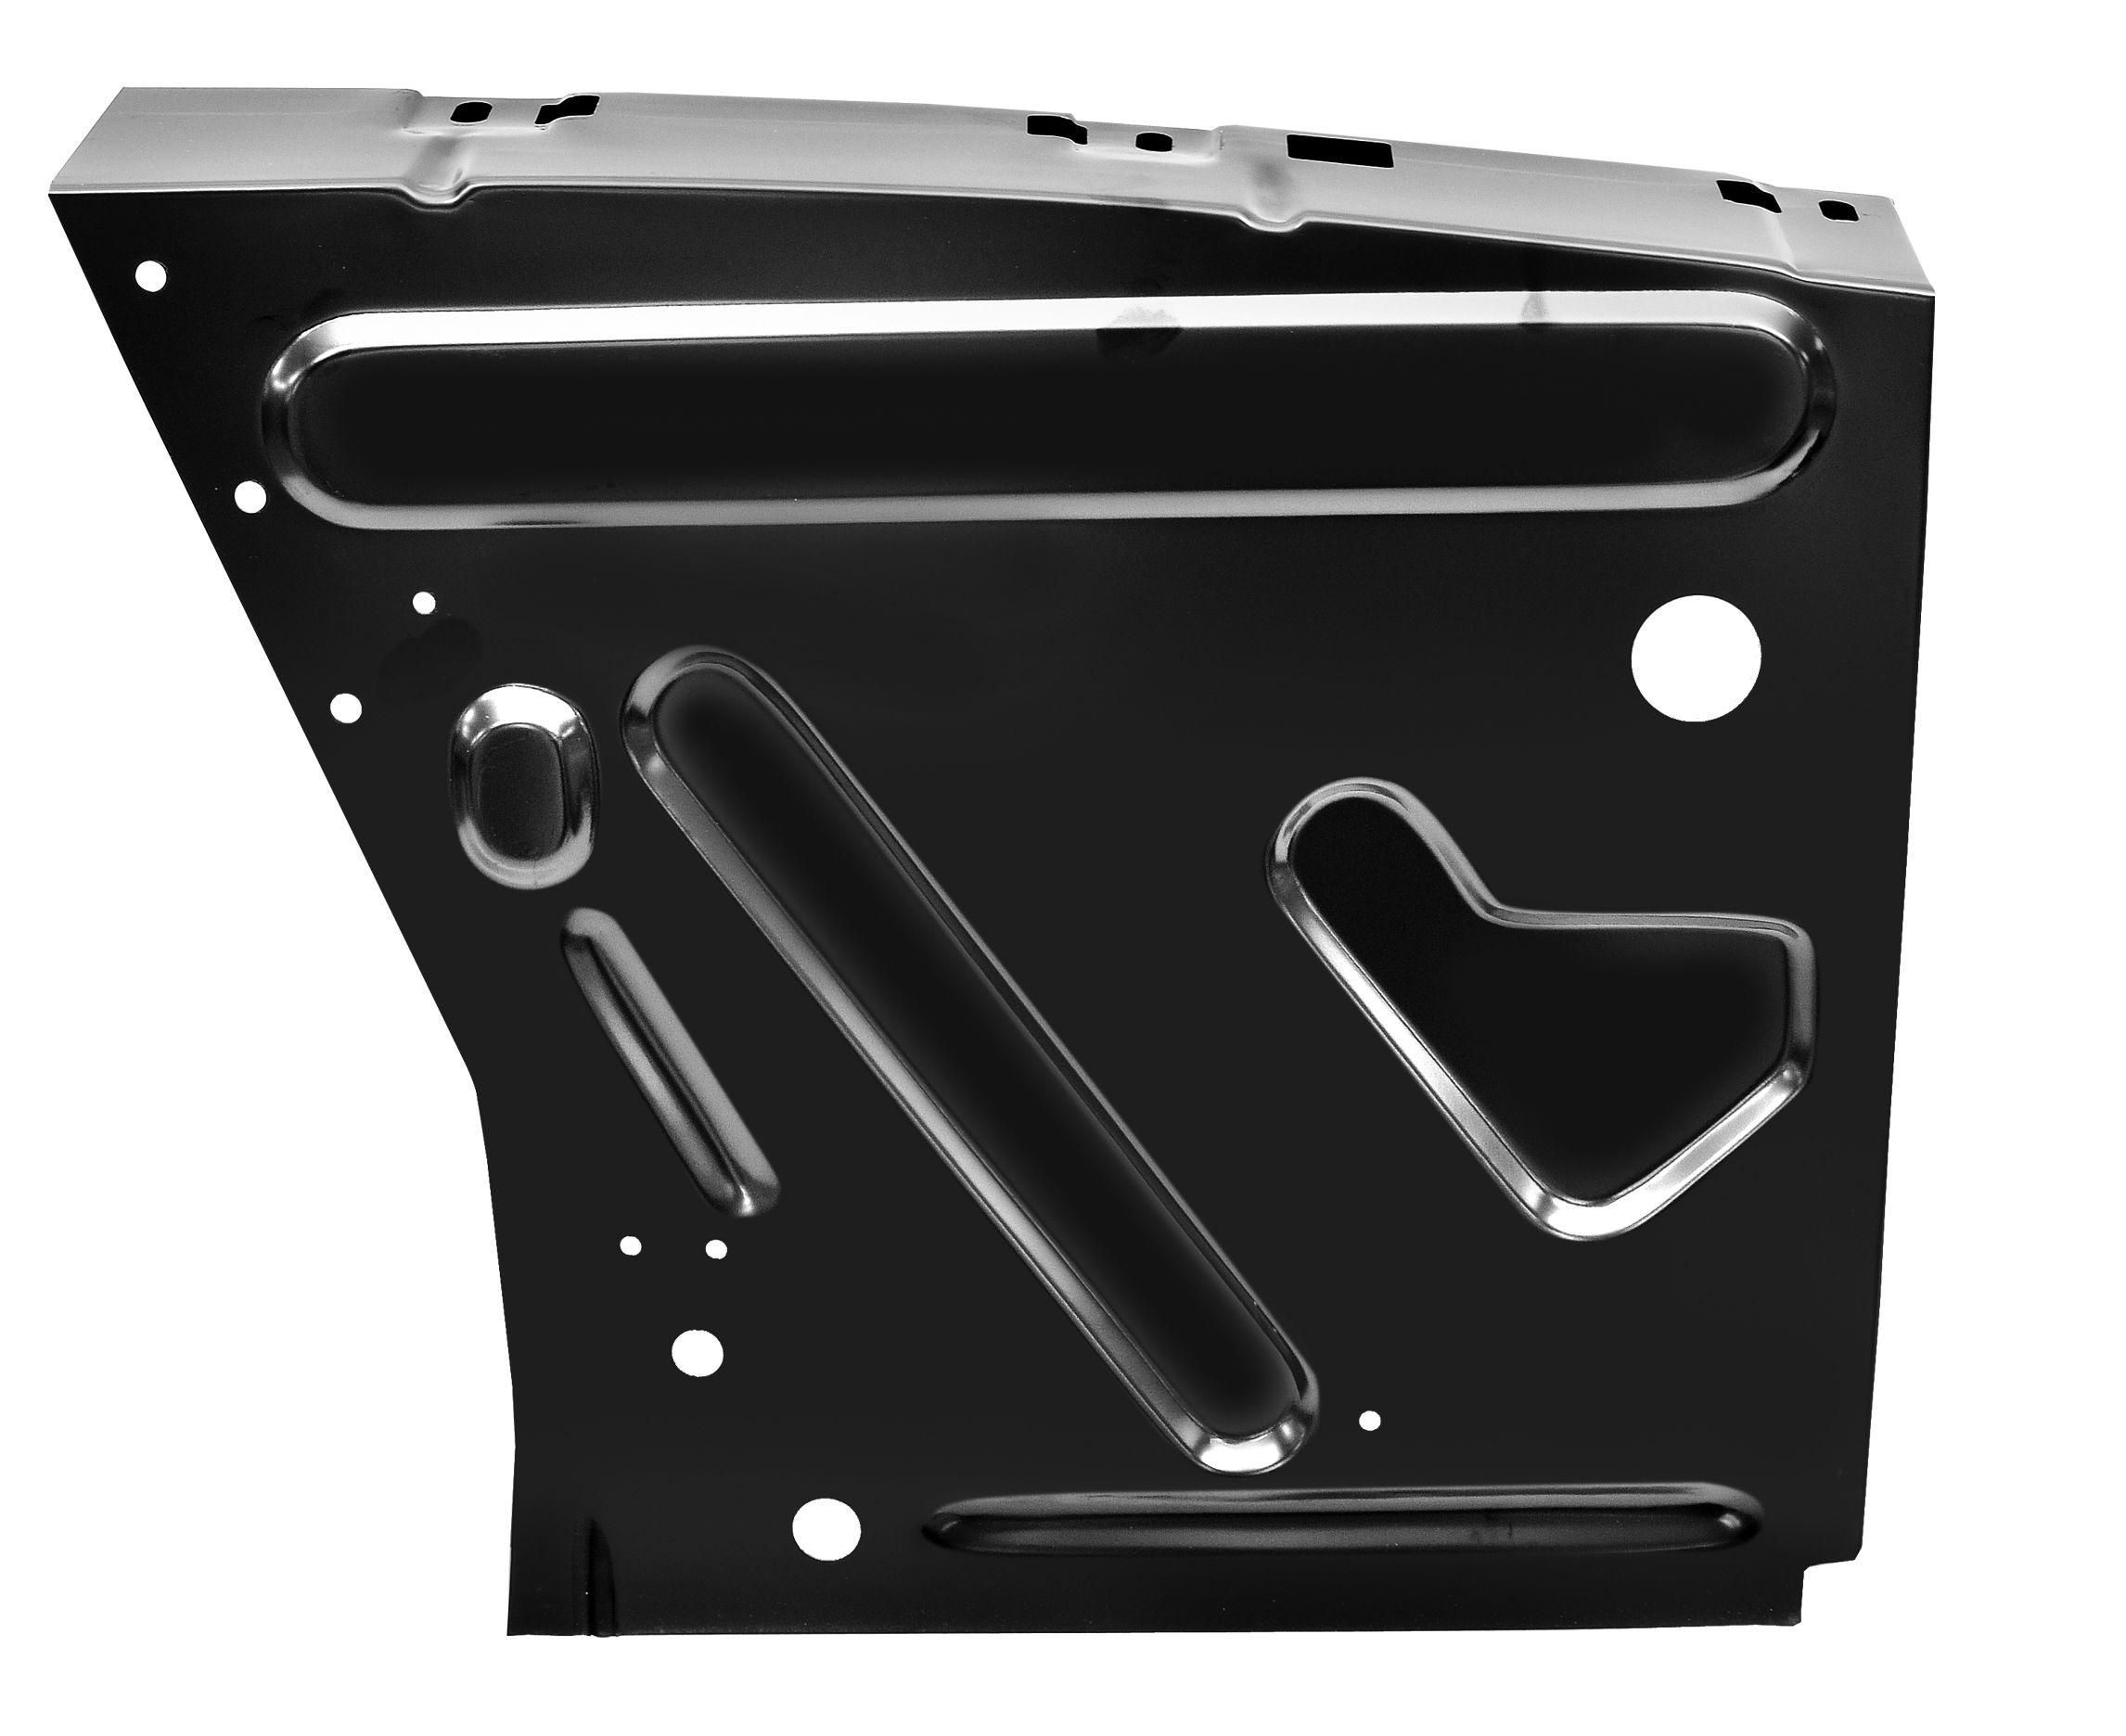 1967-68 Mustang rear fender apron rt